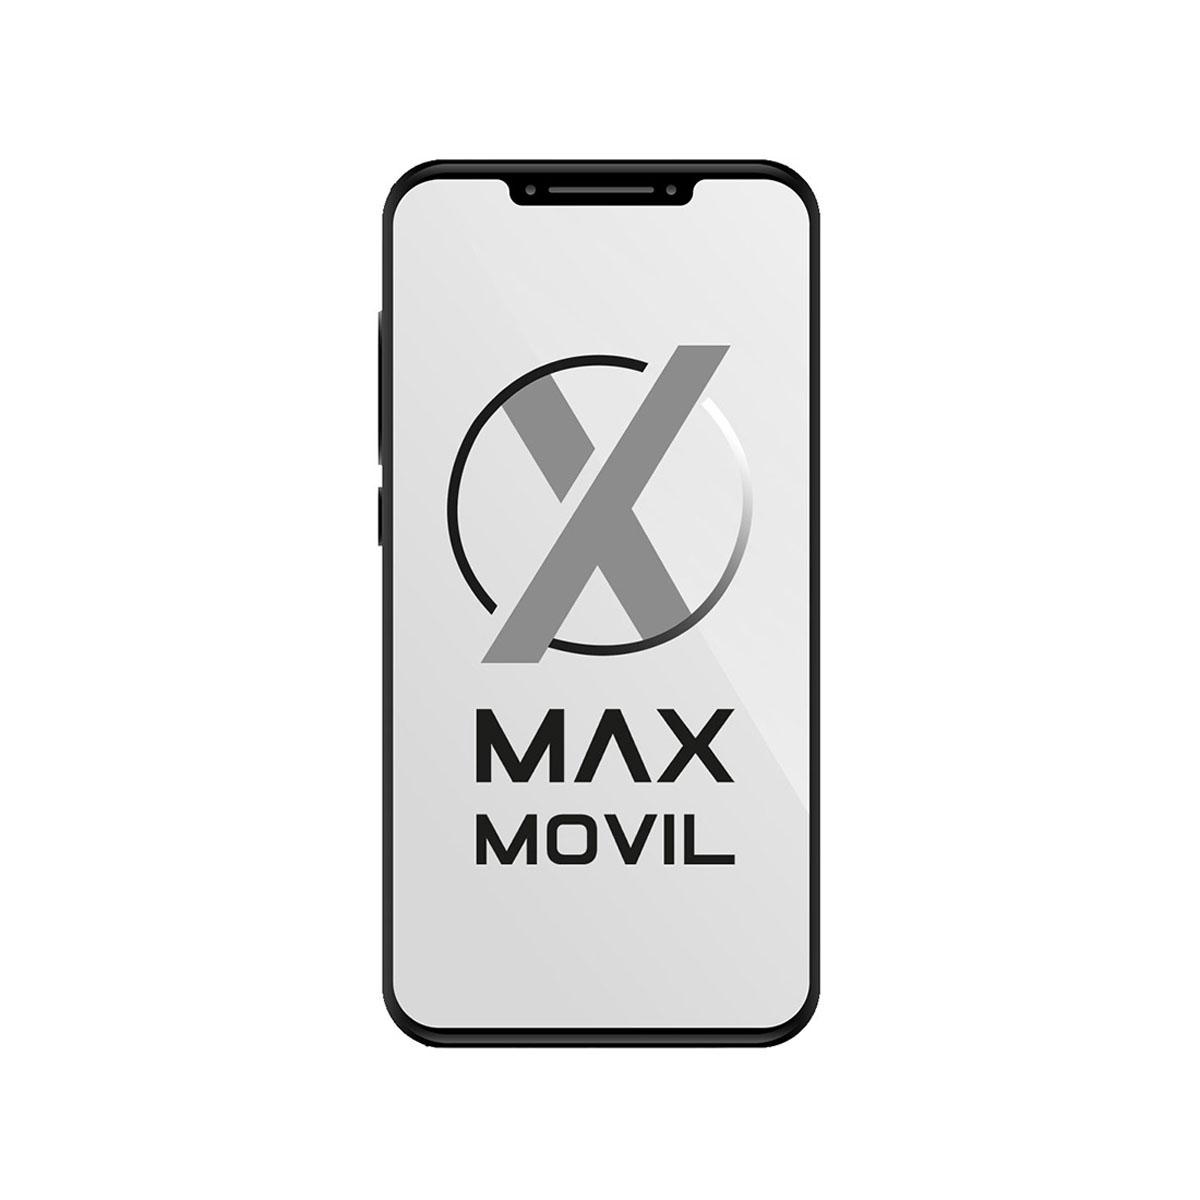 Memoria Mooster  USB TOONS 8GB scary mx 1302